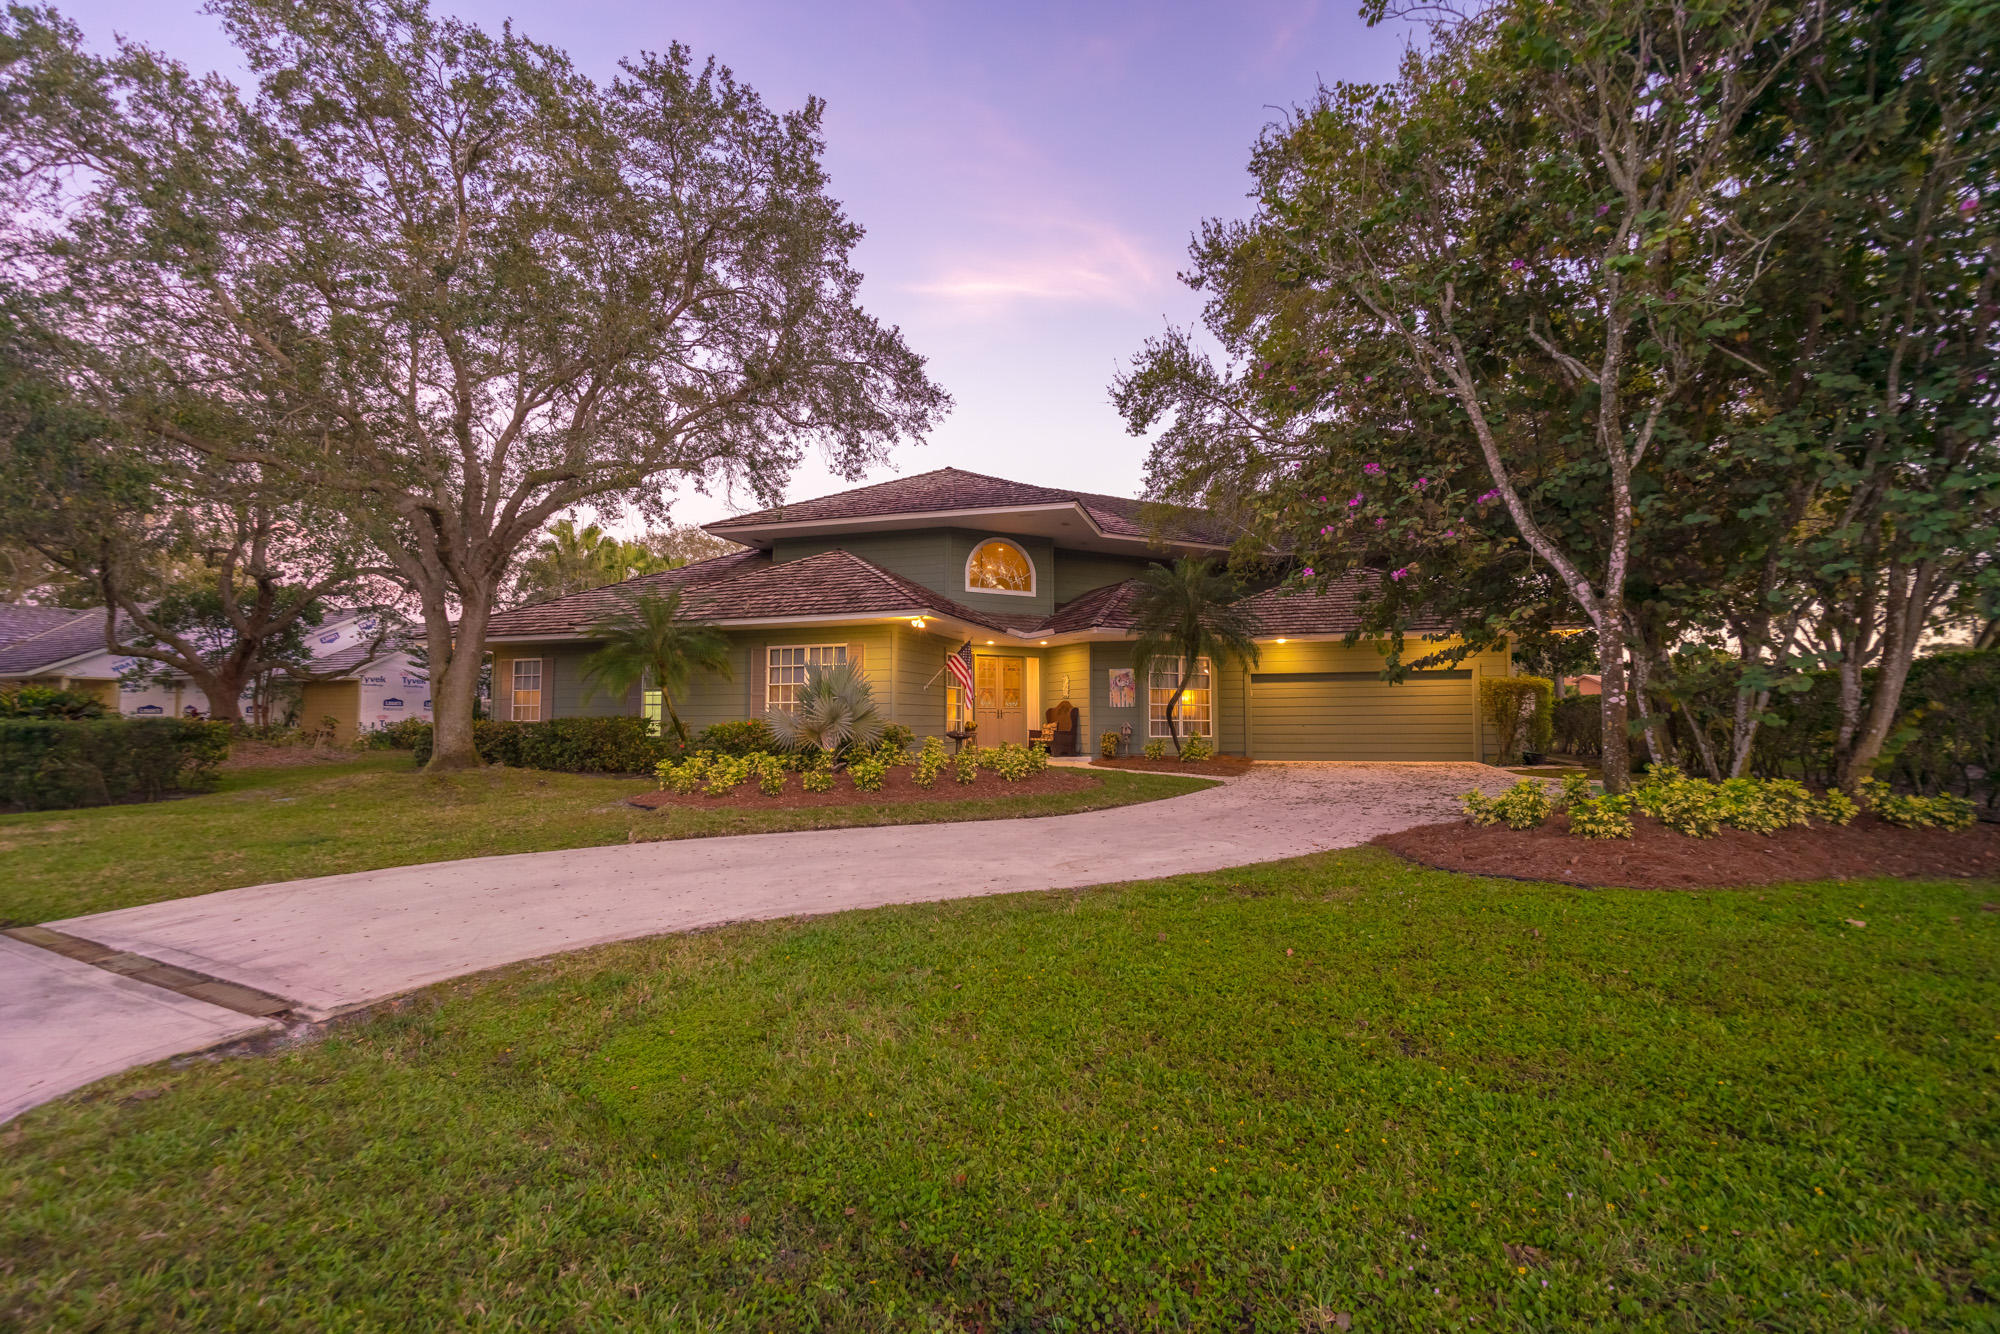 7 Alnwick Road, Palm Beach Gardens, Florida 33418, 4 Bedrooms Bedrooms, ,3.1 BathroomsBathrooms,A,Single family,Alnwick,RX-10598698